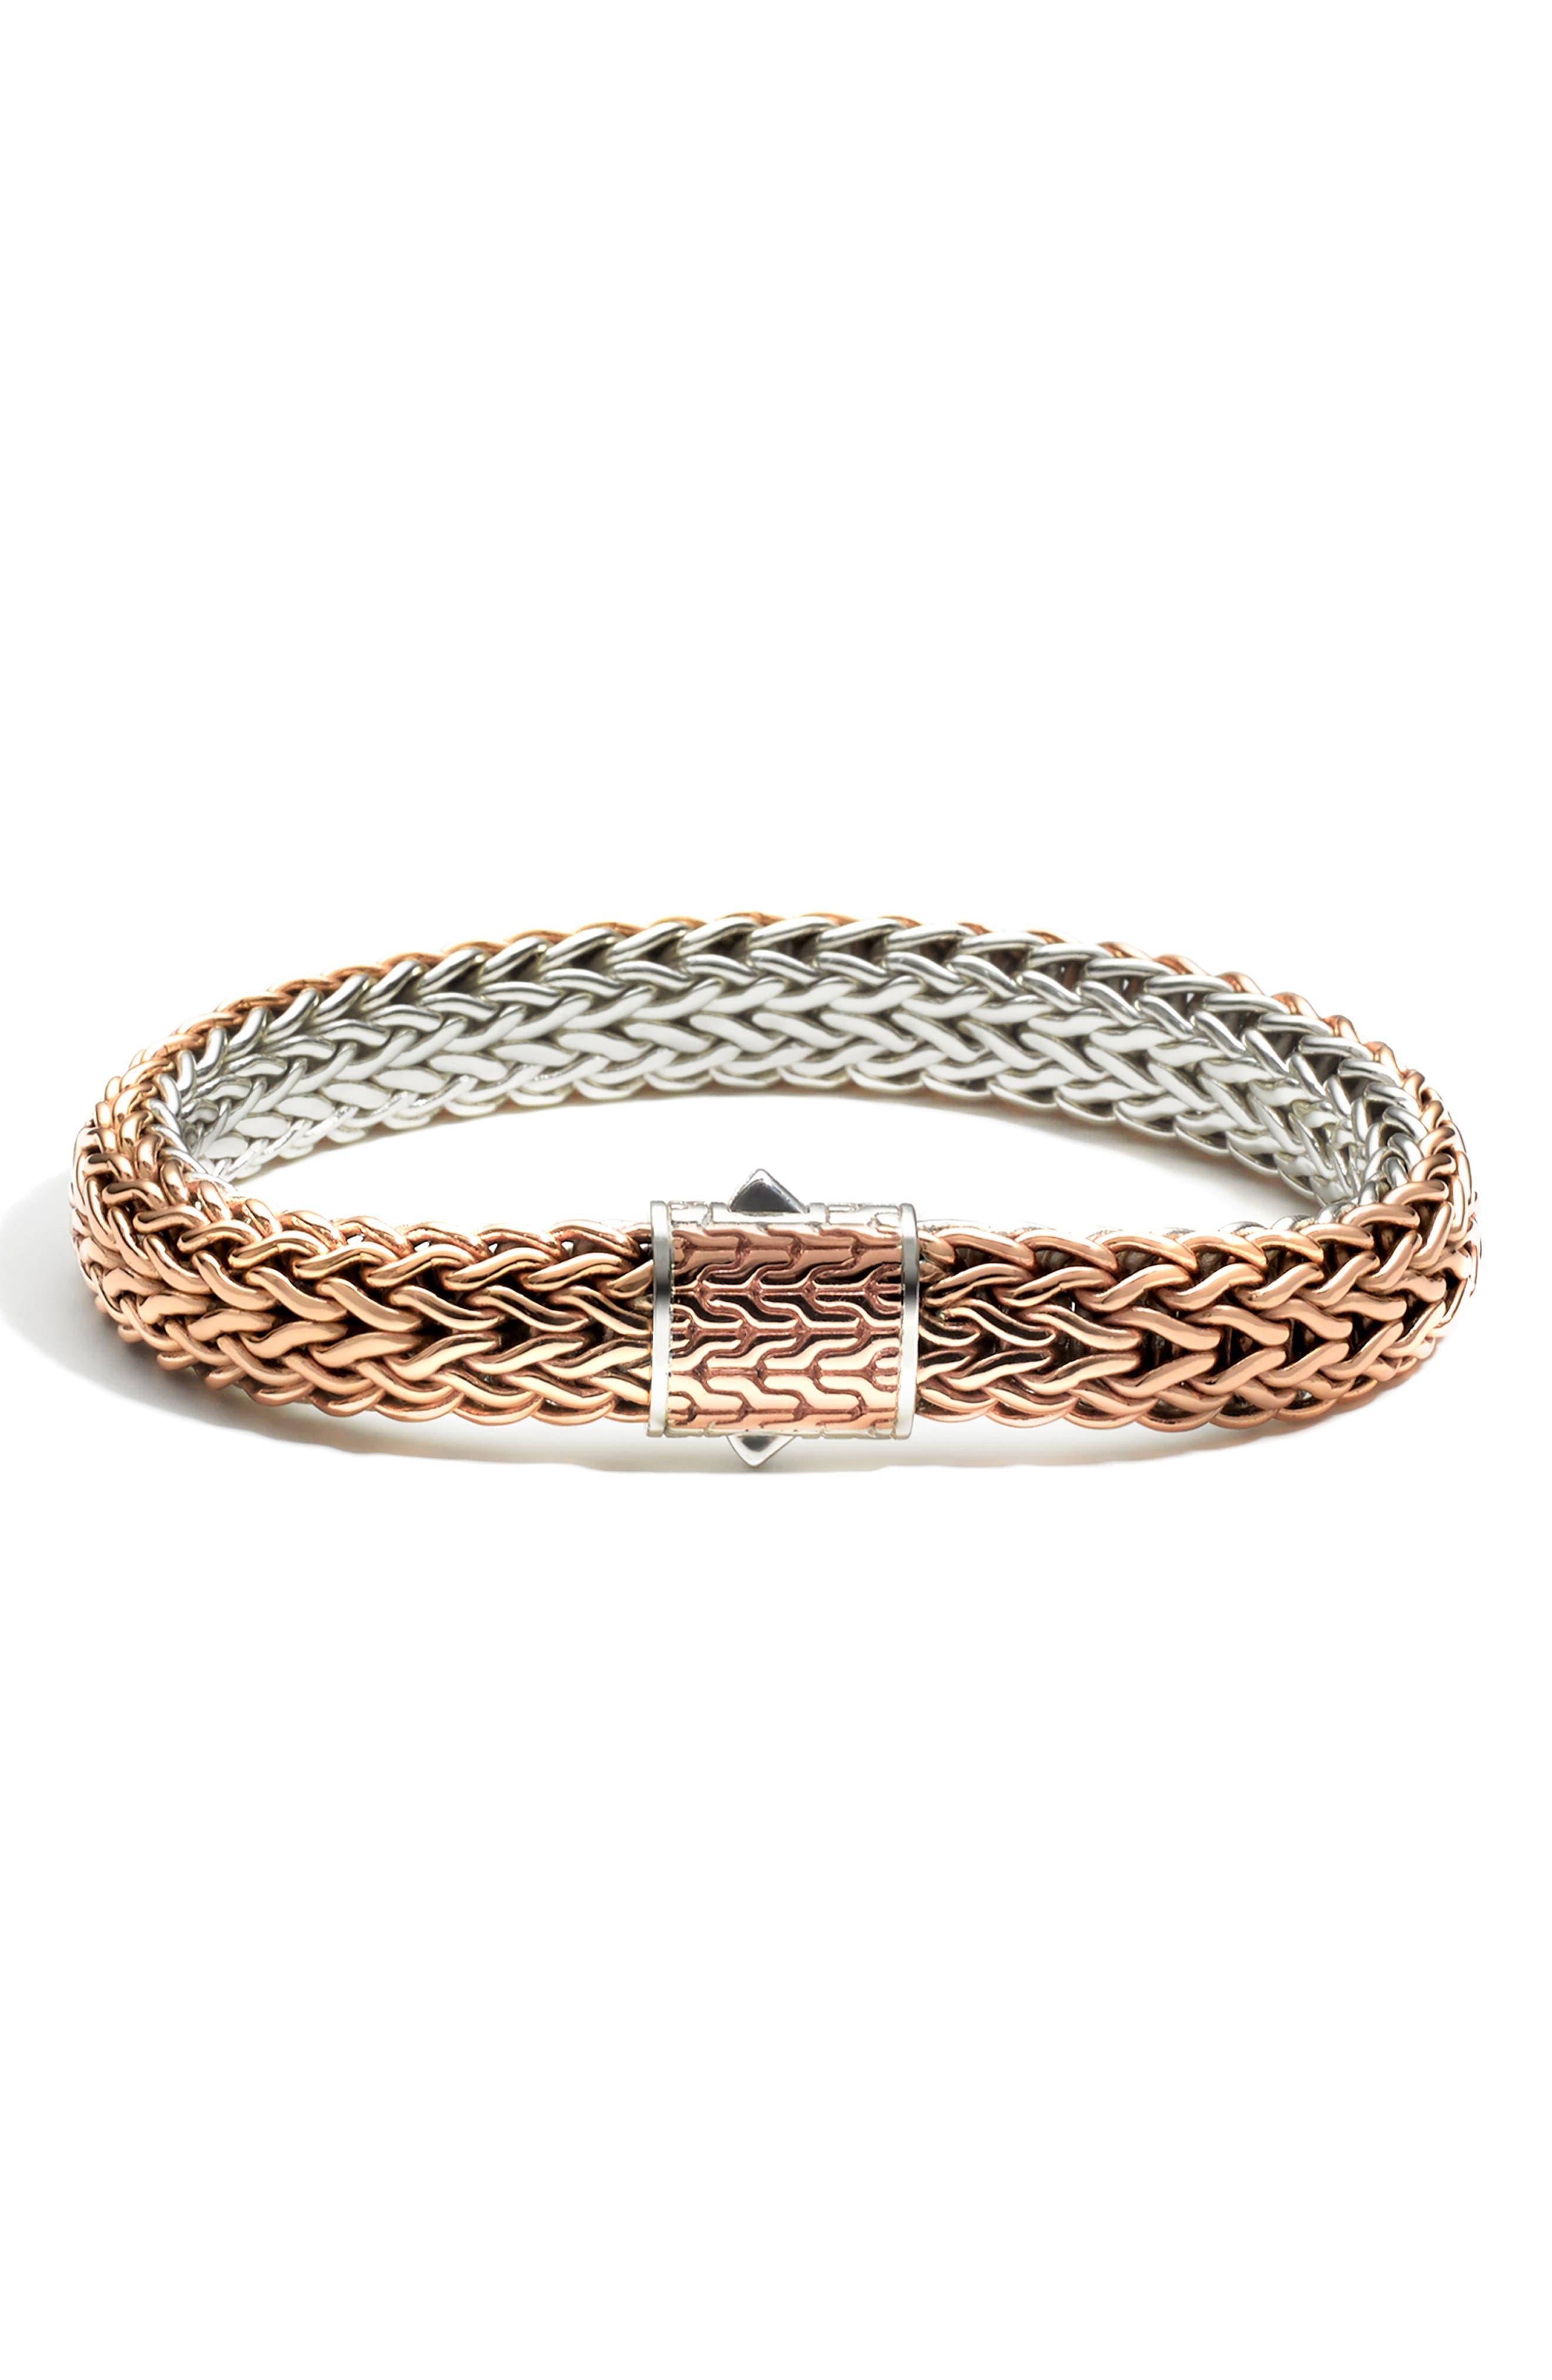 Classic Chain Flat Chain Reversible Bracelet,                             Main thumbnail 1, color,                             BRONZE/ SILVER